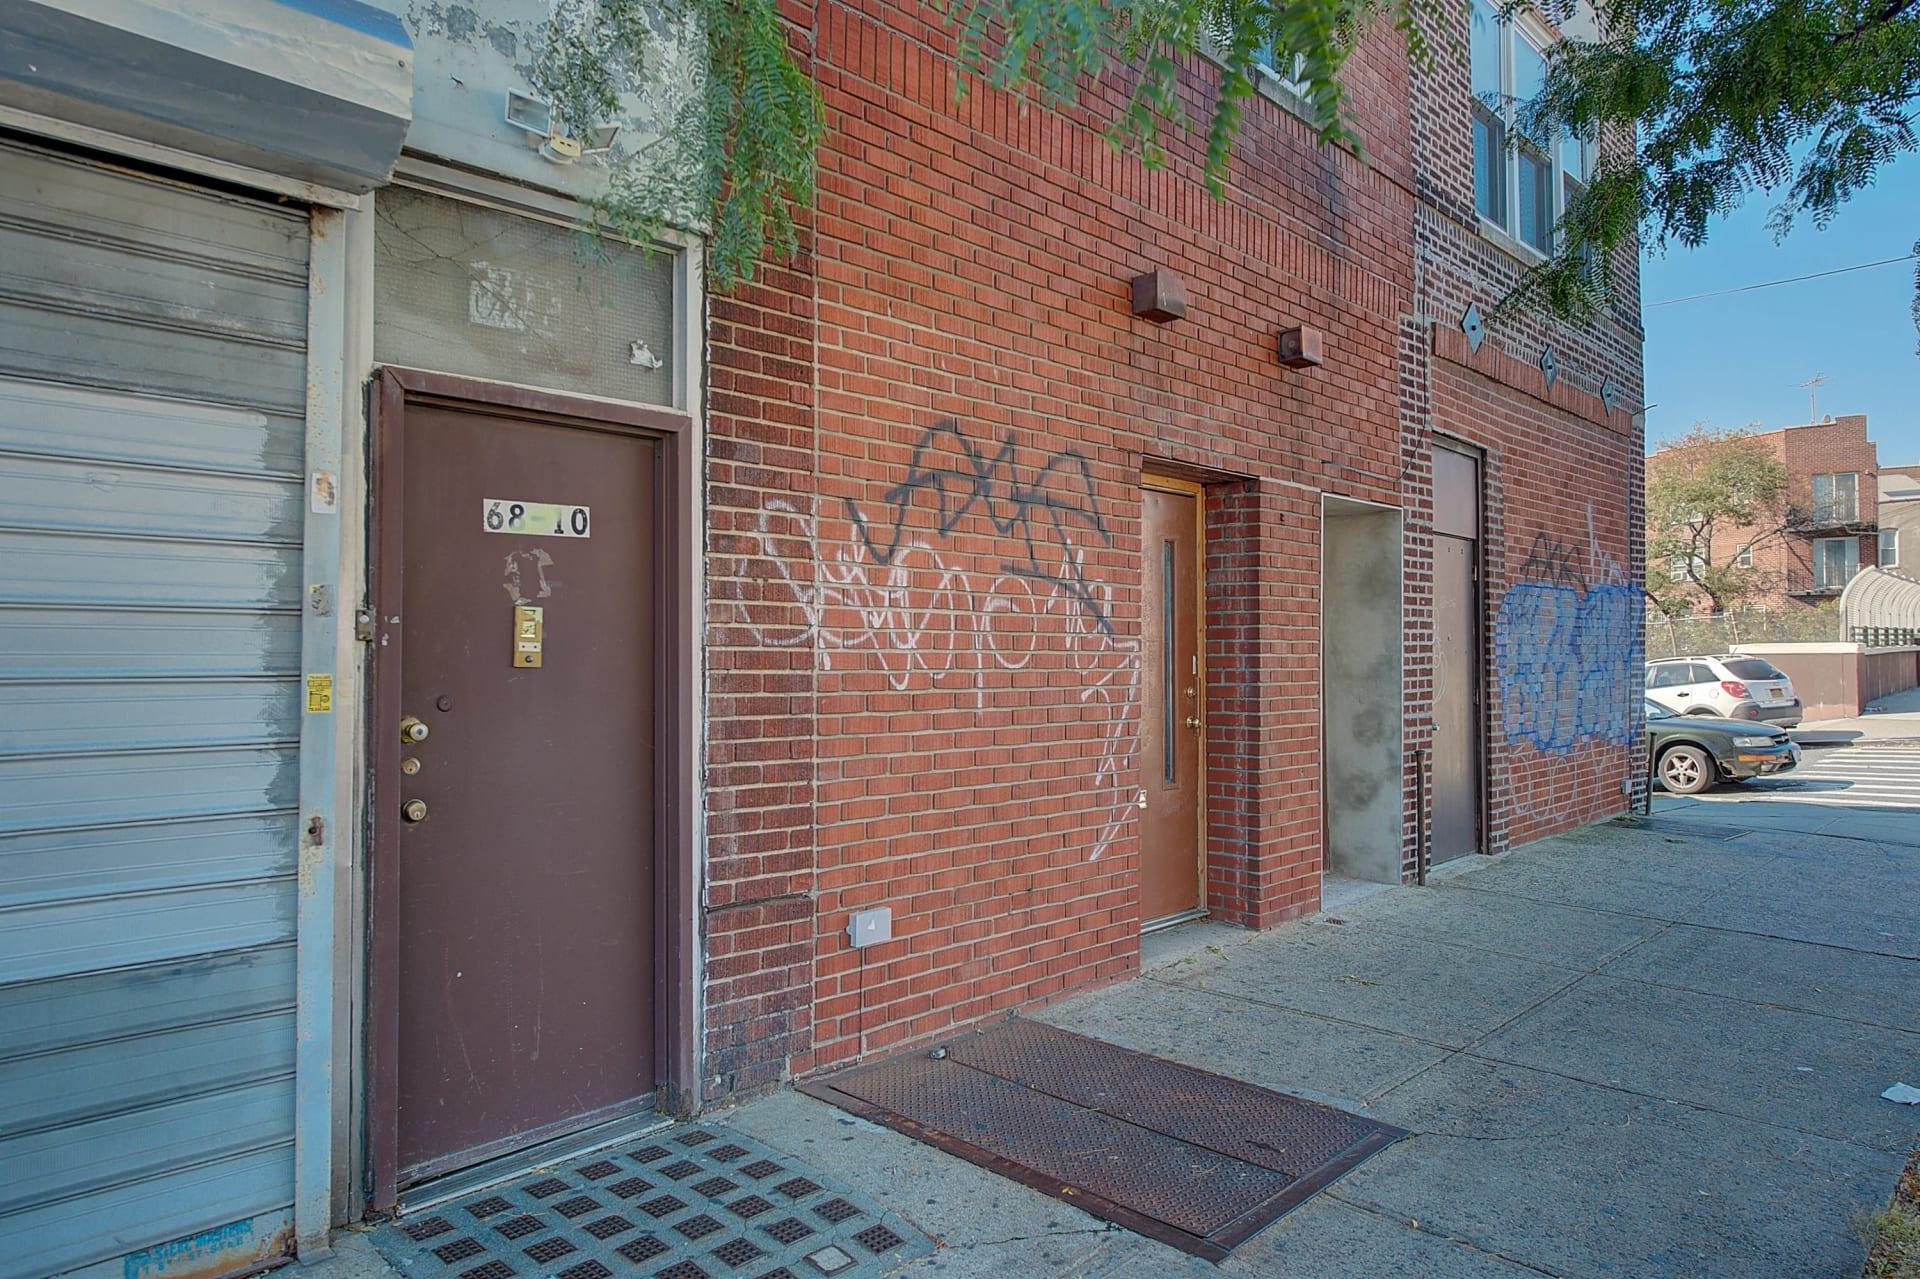 68-10 Woodside Ave photo